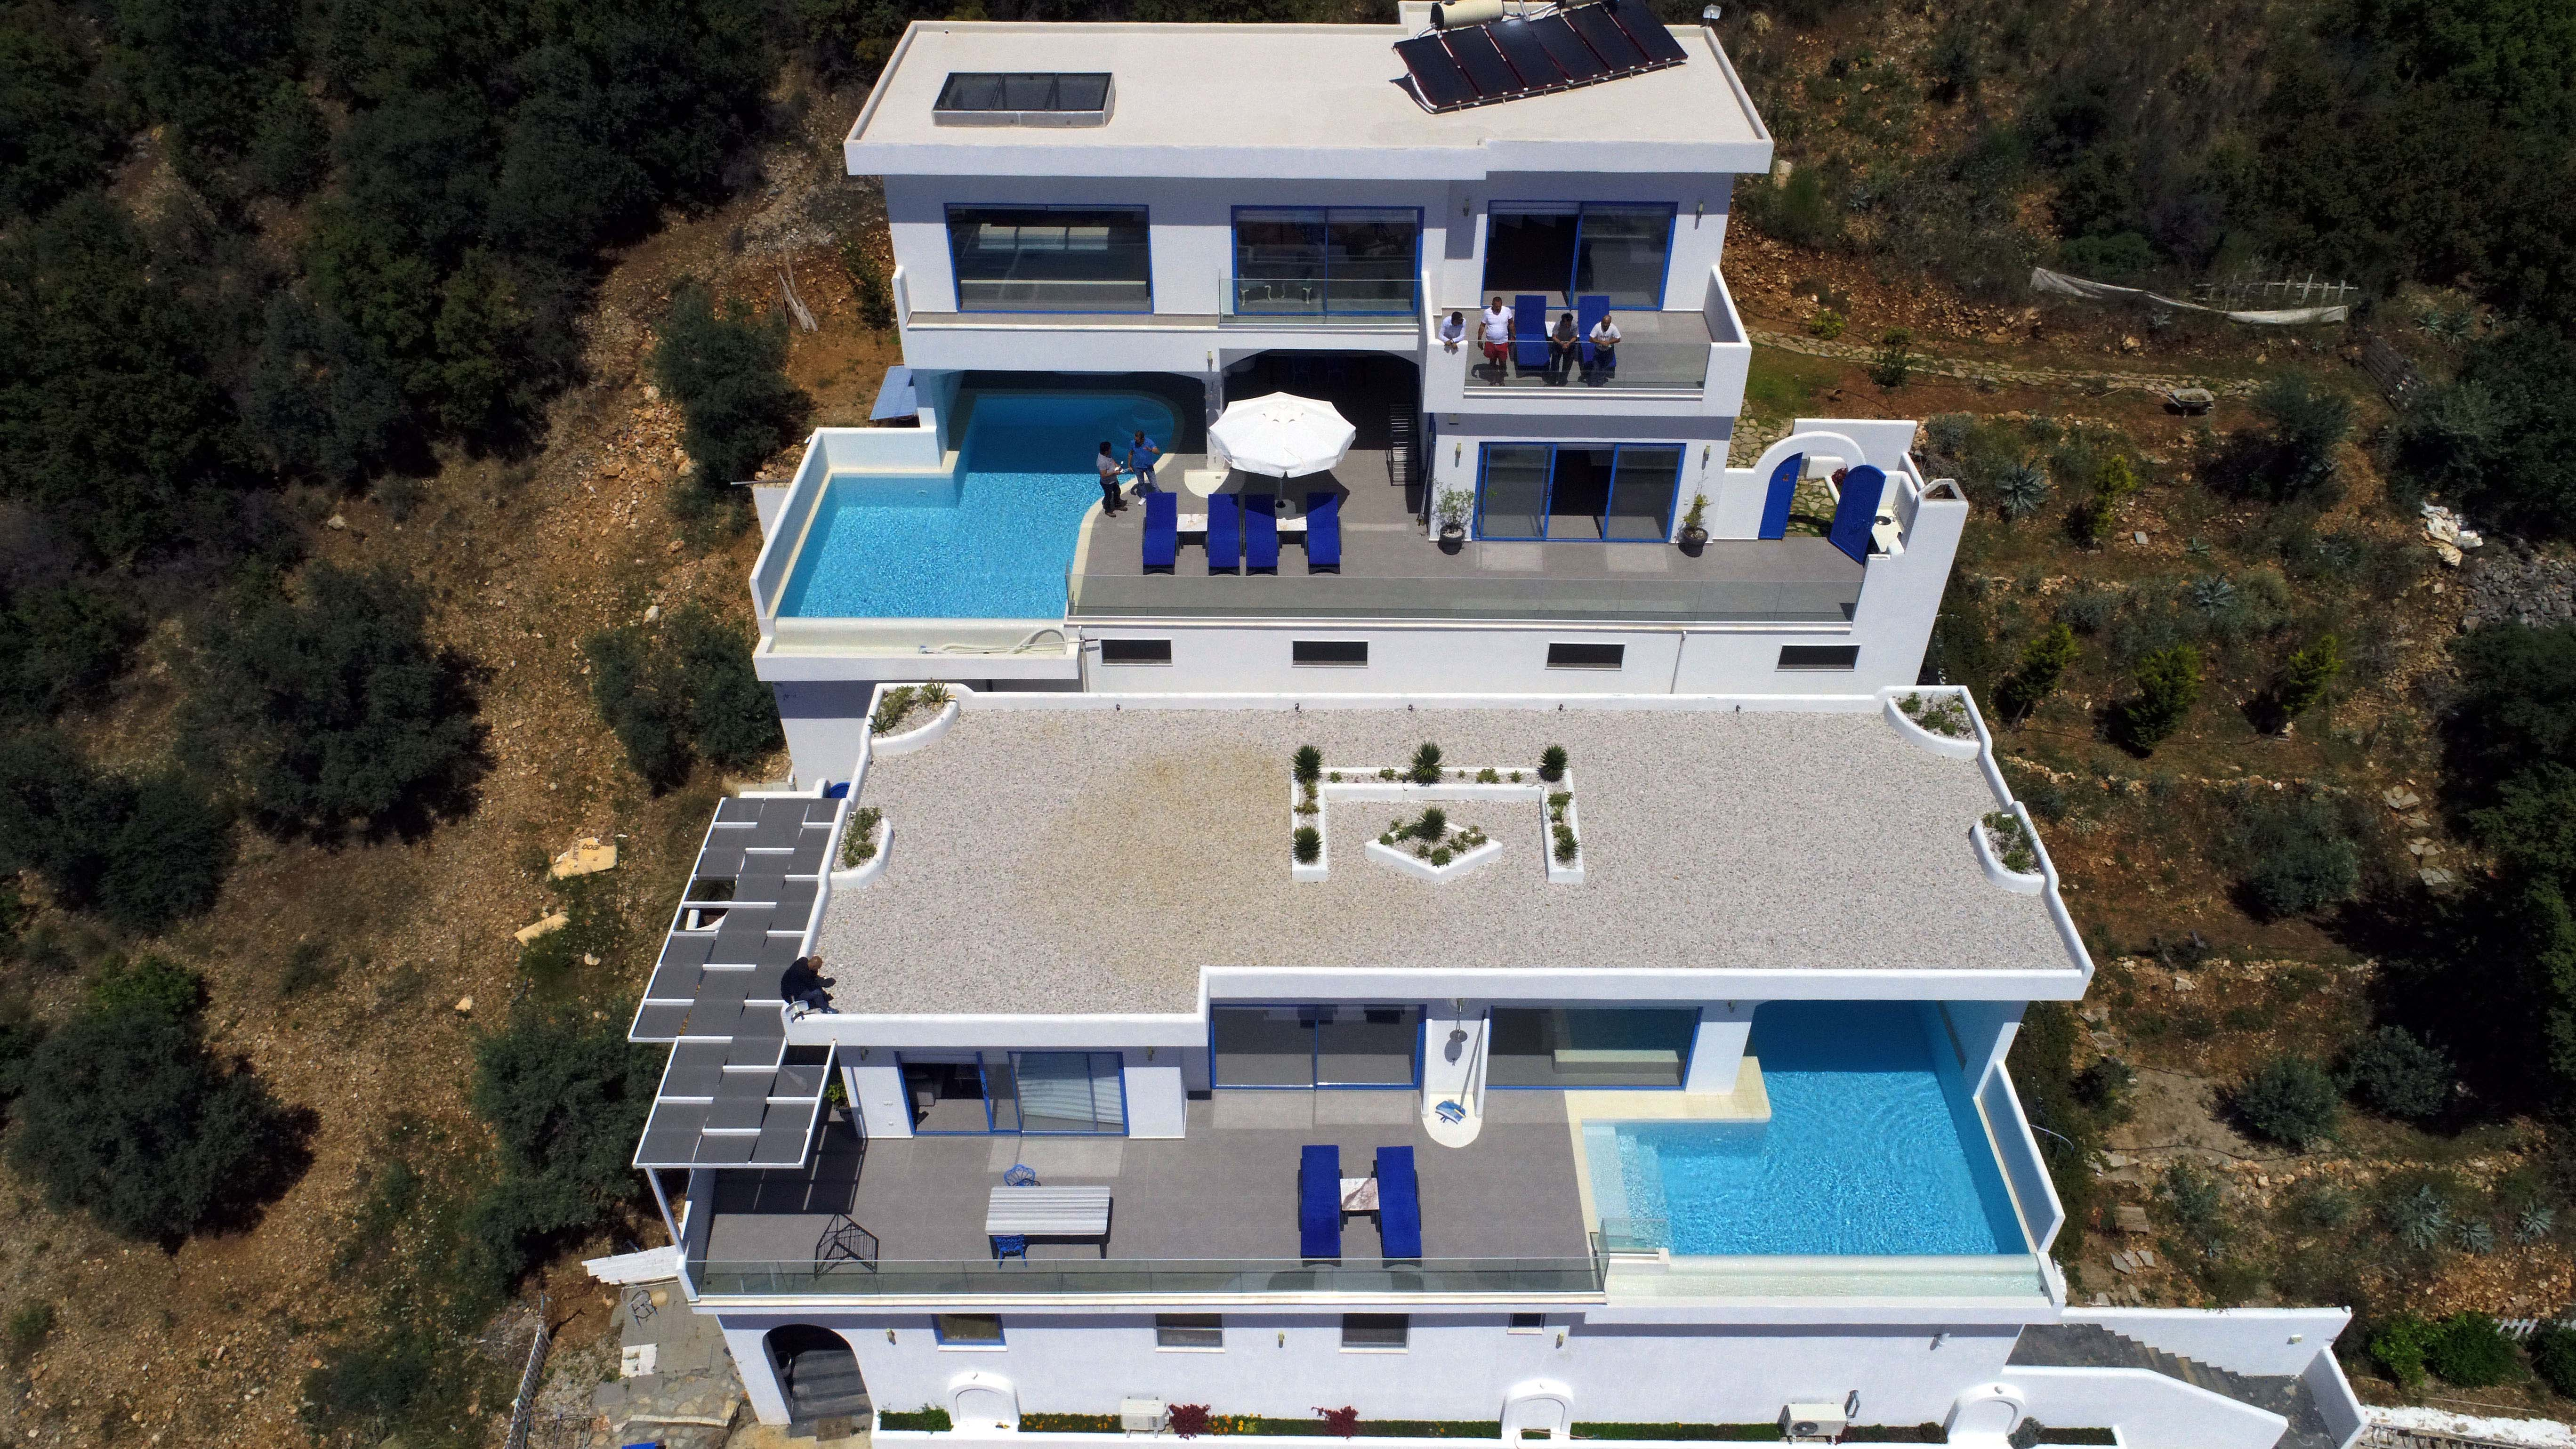 luks-villa-kiralamak-isteyen-tatilcilere-kopya-site-soku-7619-dhaphoto5.jpg